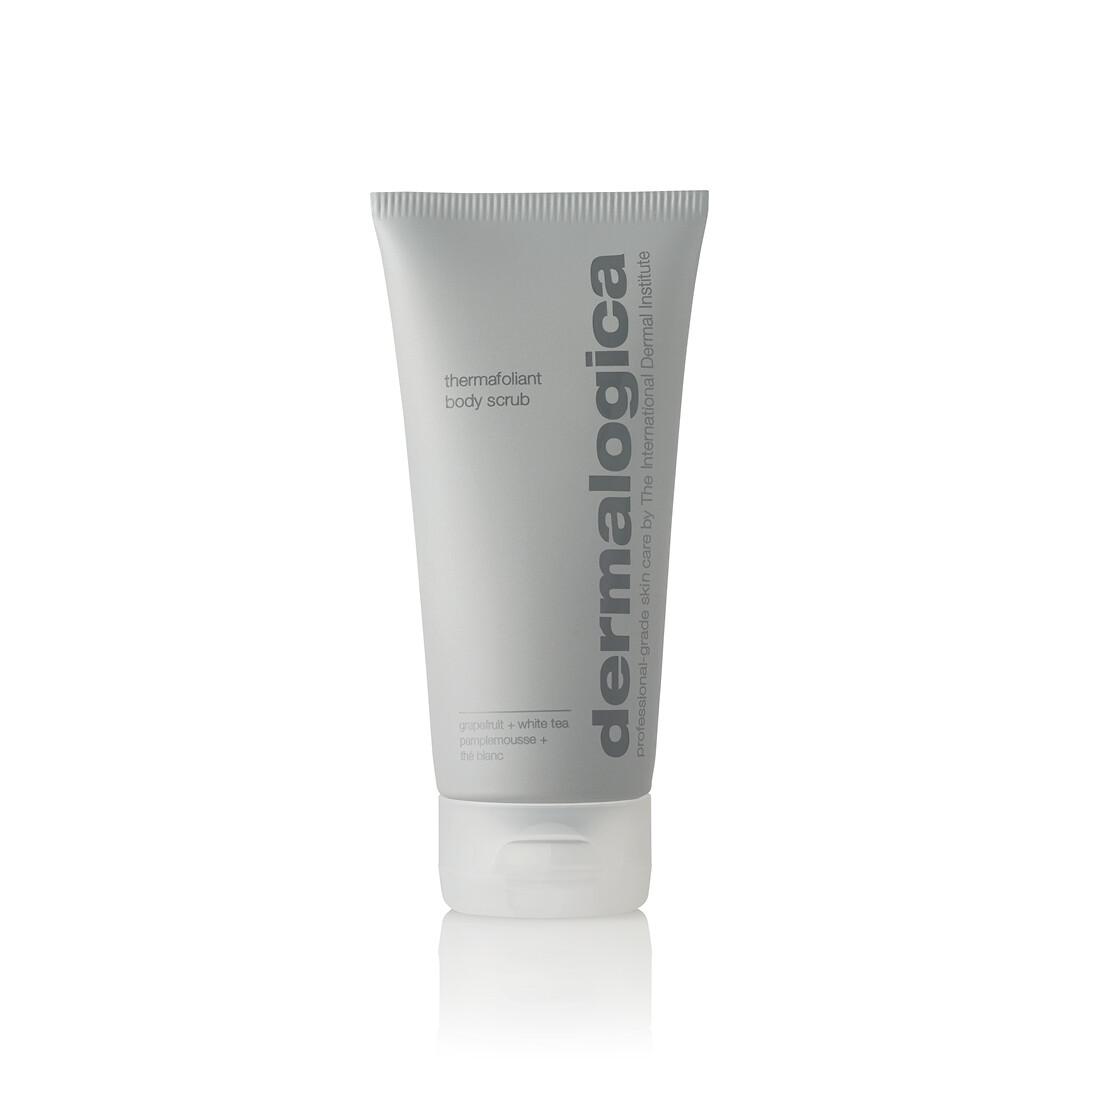 dermalogica® Thermafoliant Body Scrub 177ml